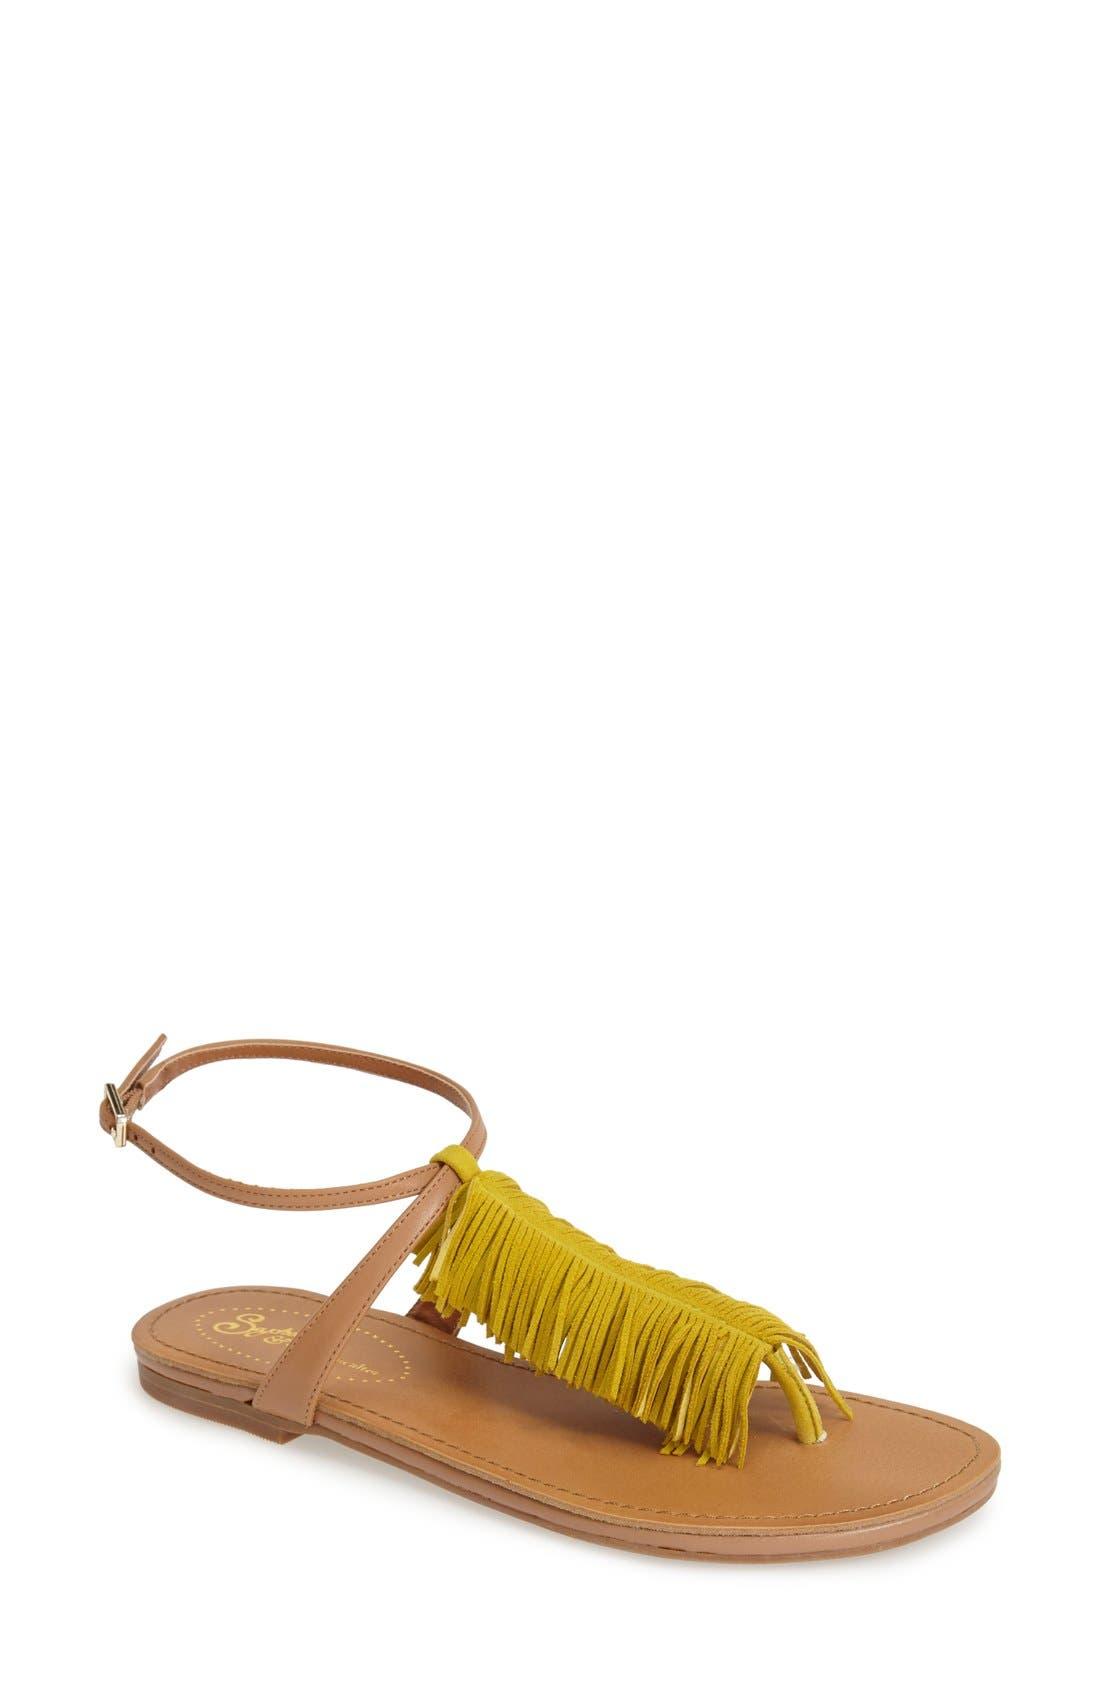 Main Image - Seychelles 'Confetti' Ankle Strap Sandal (Women)